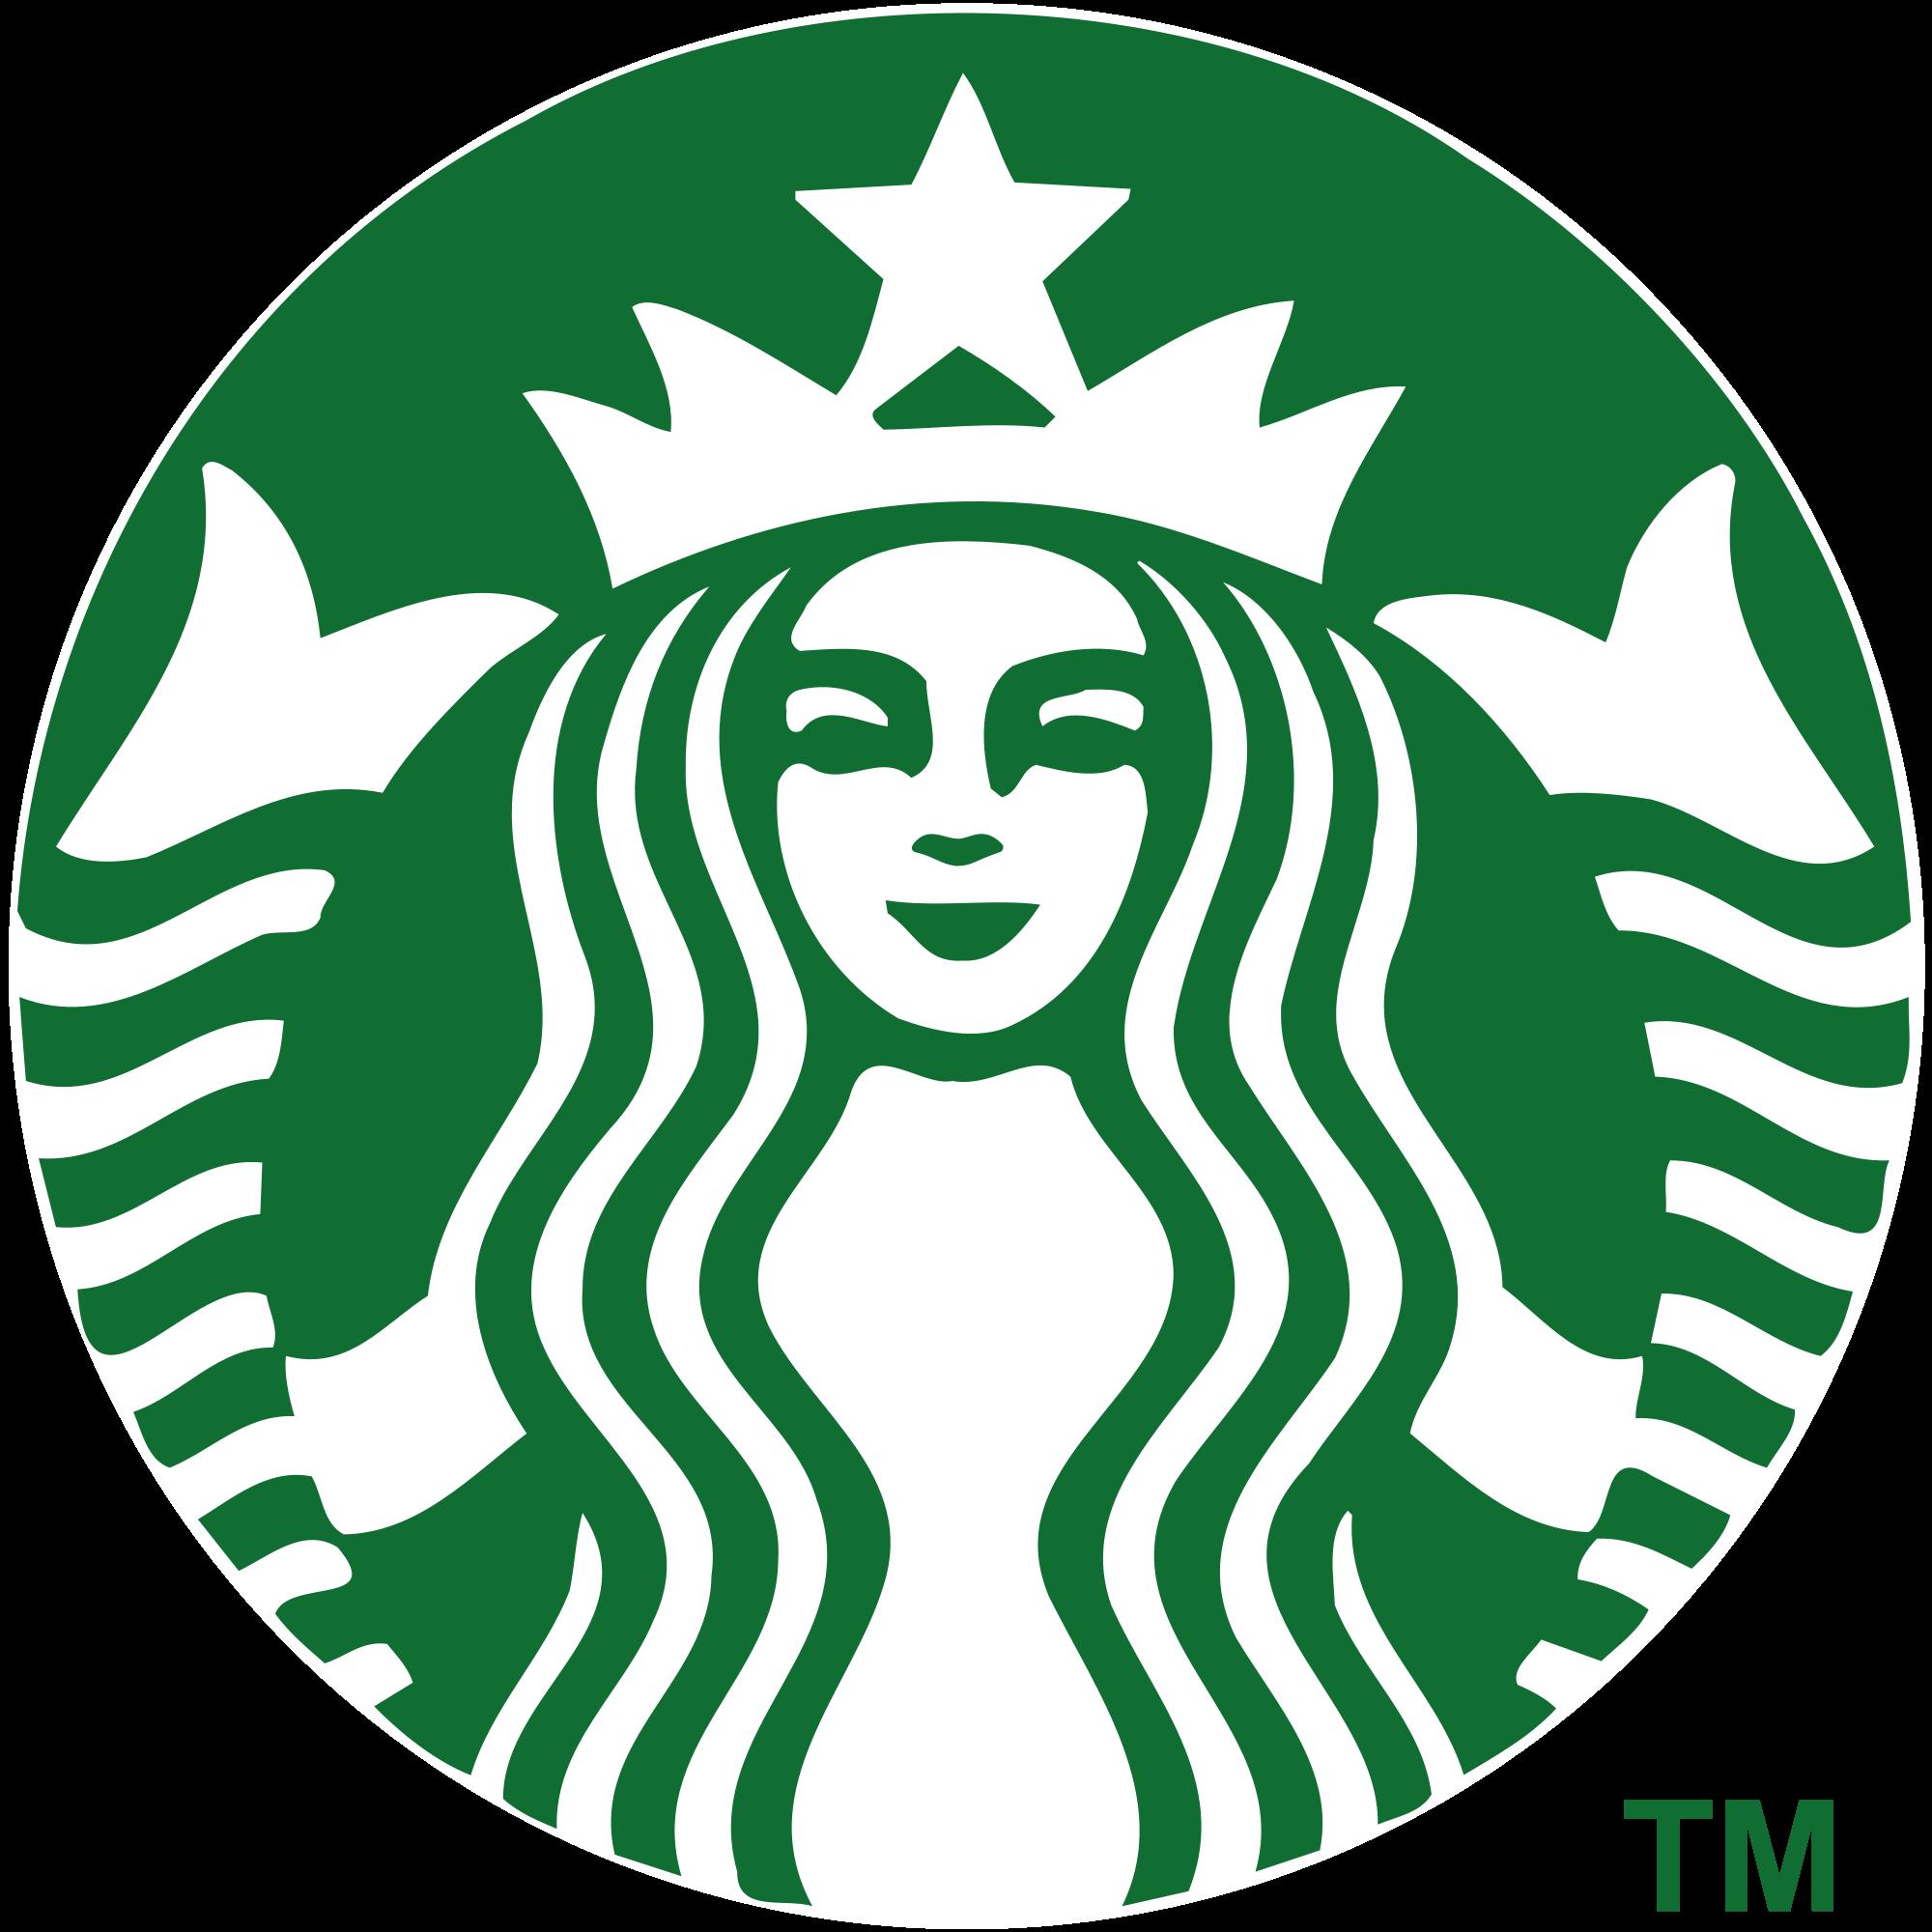 starbucks coffe logo hd image #1680